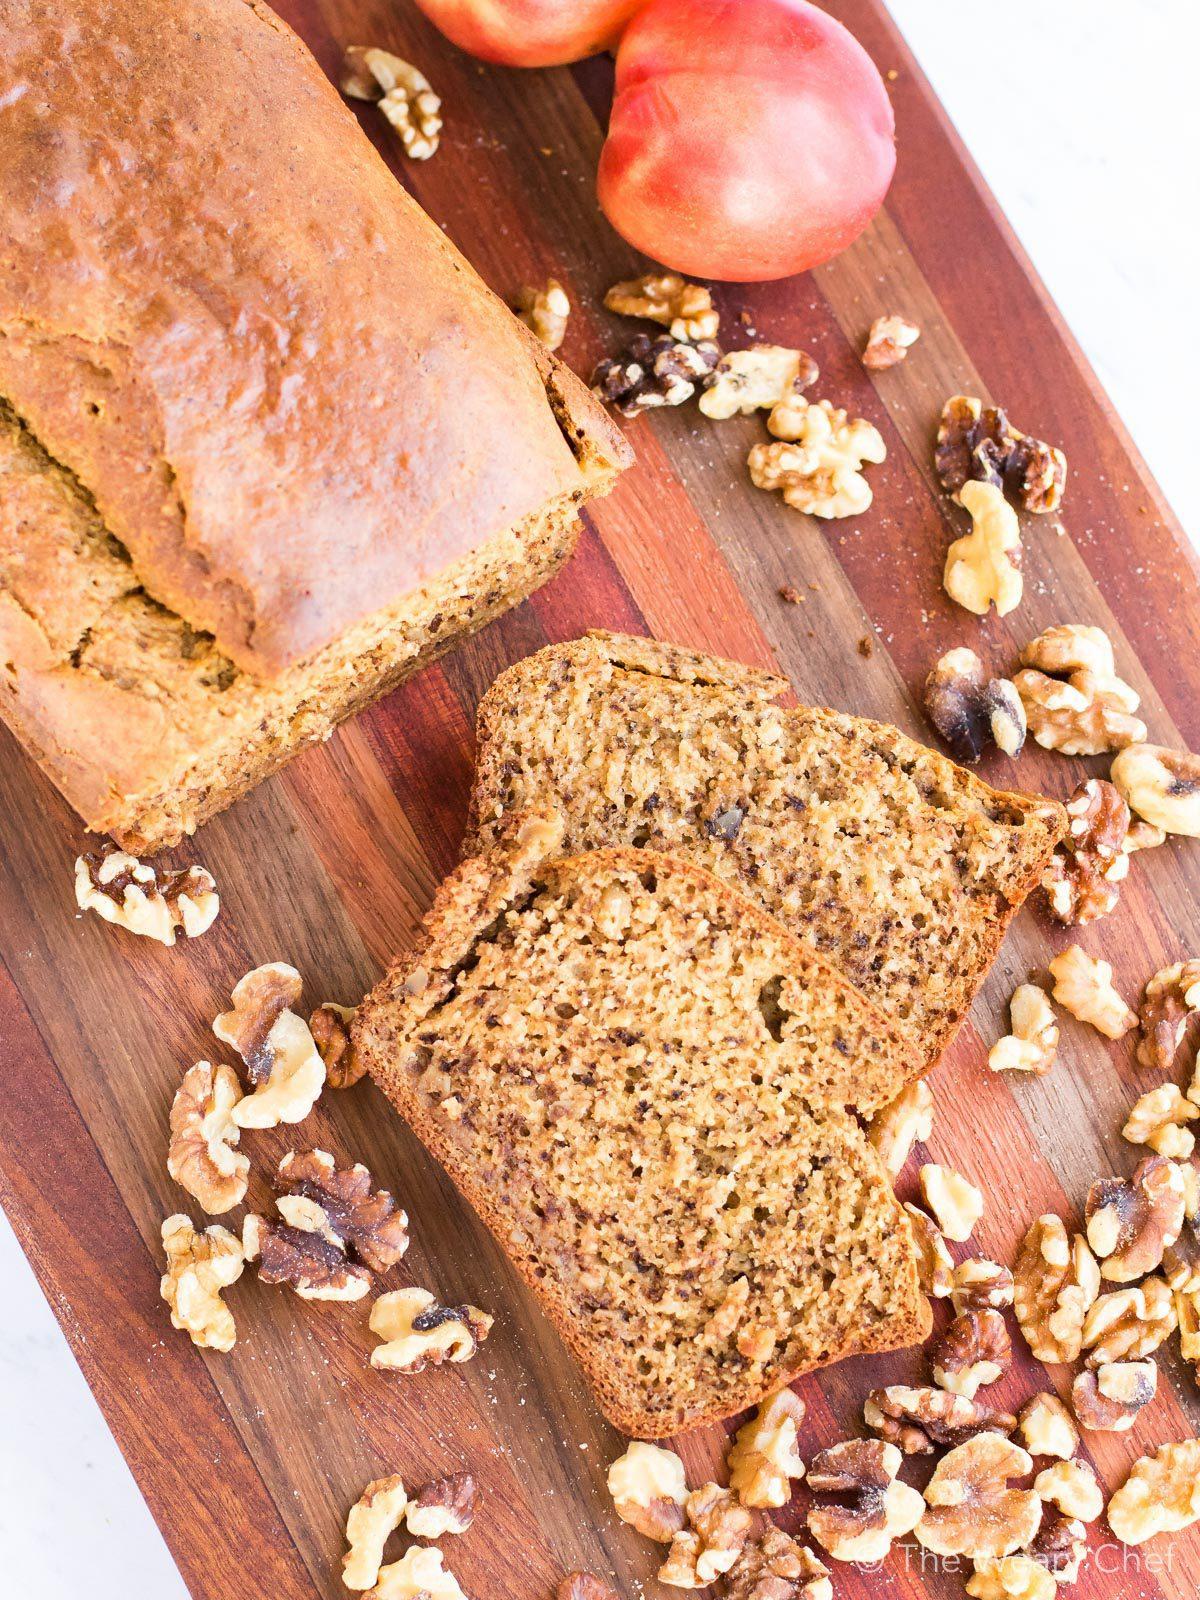 Peach bread with walnuts is a perfect breakfast treat!